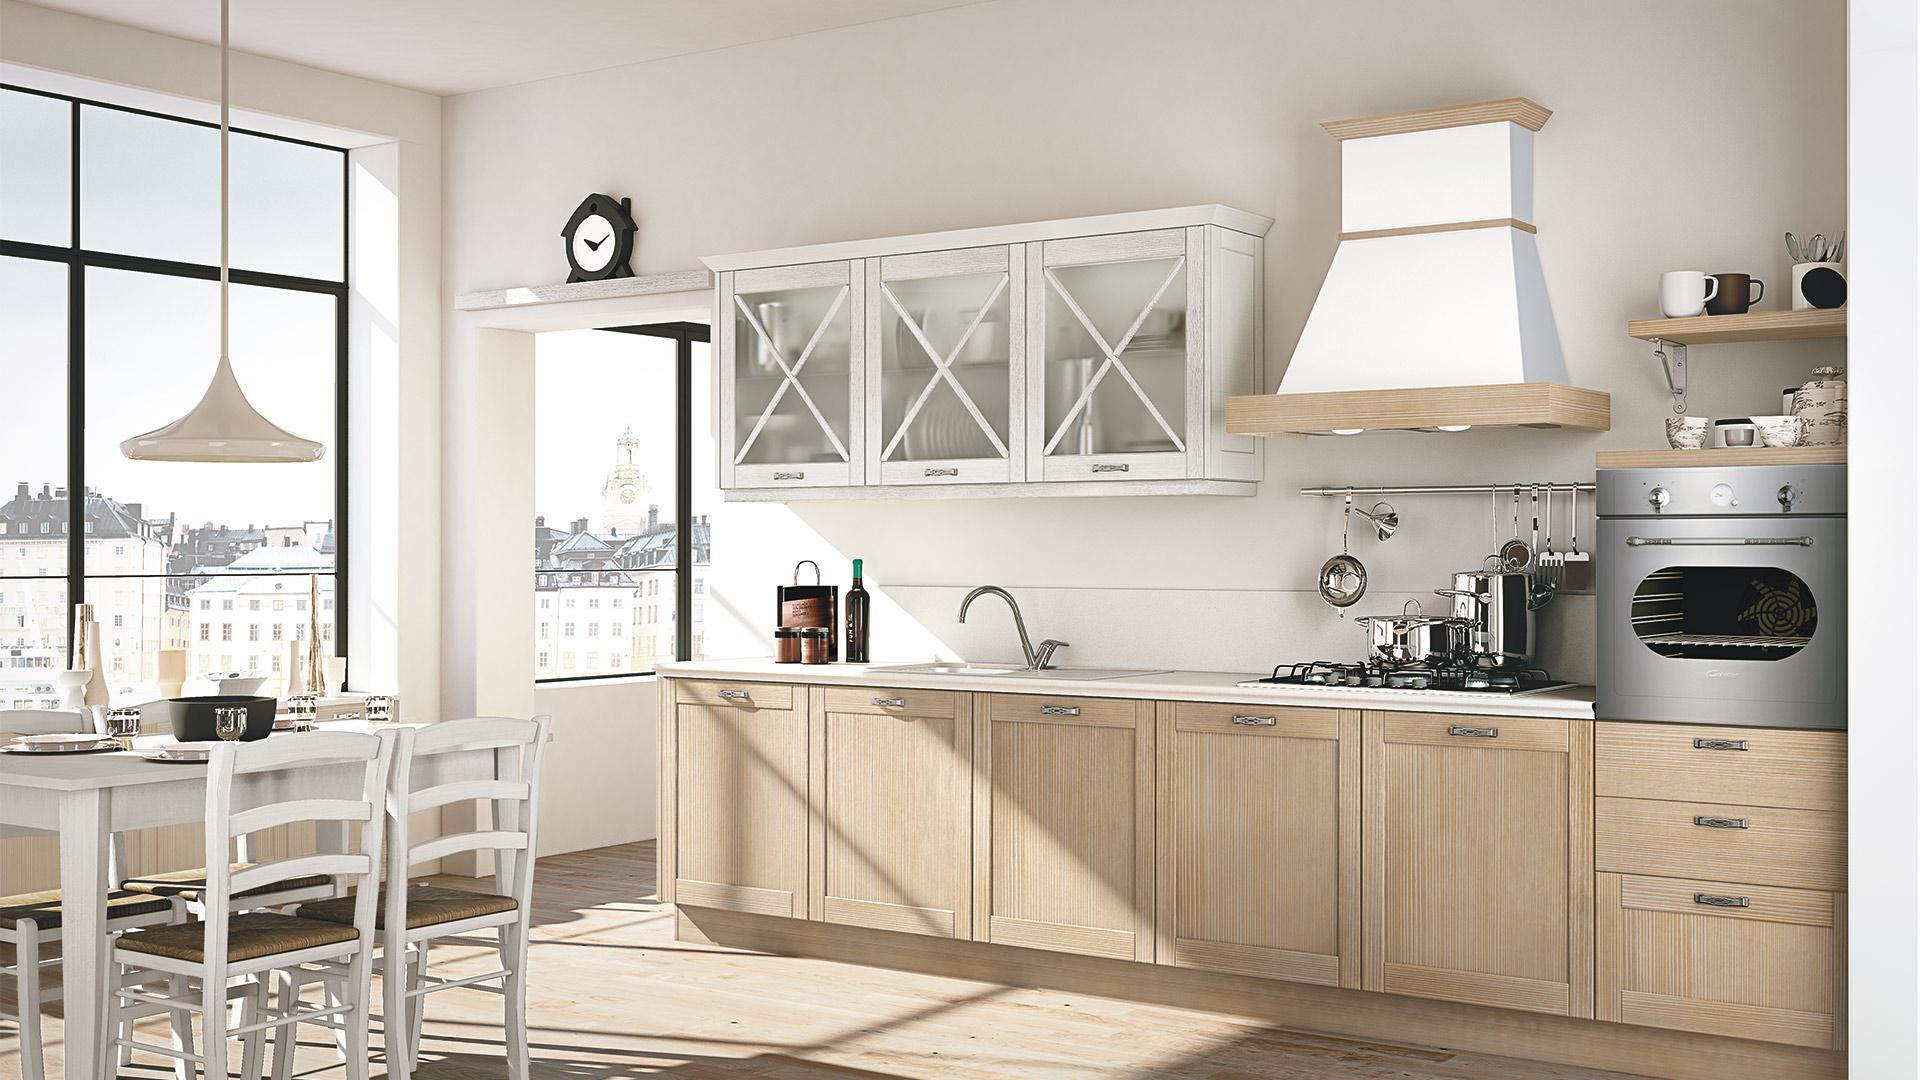 Cucina vivian cucine componibili creo kitchens